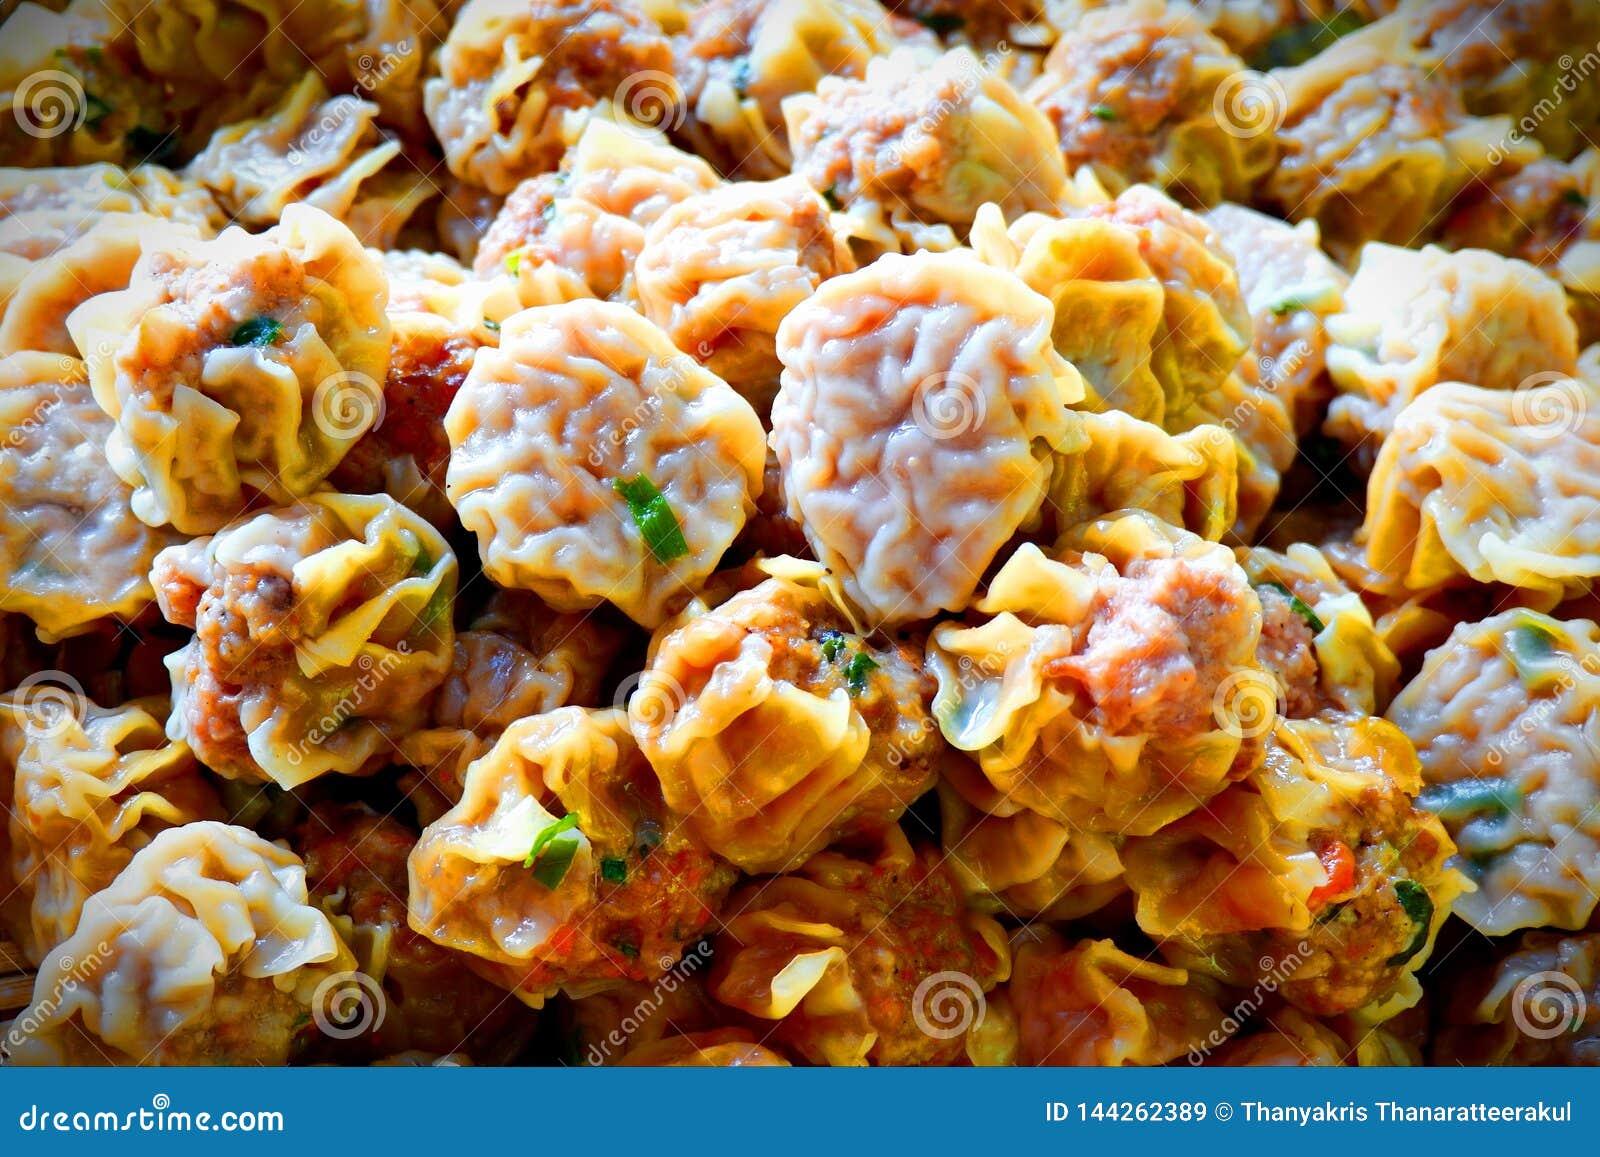 Dumpling food from China.